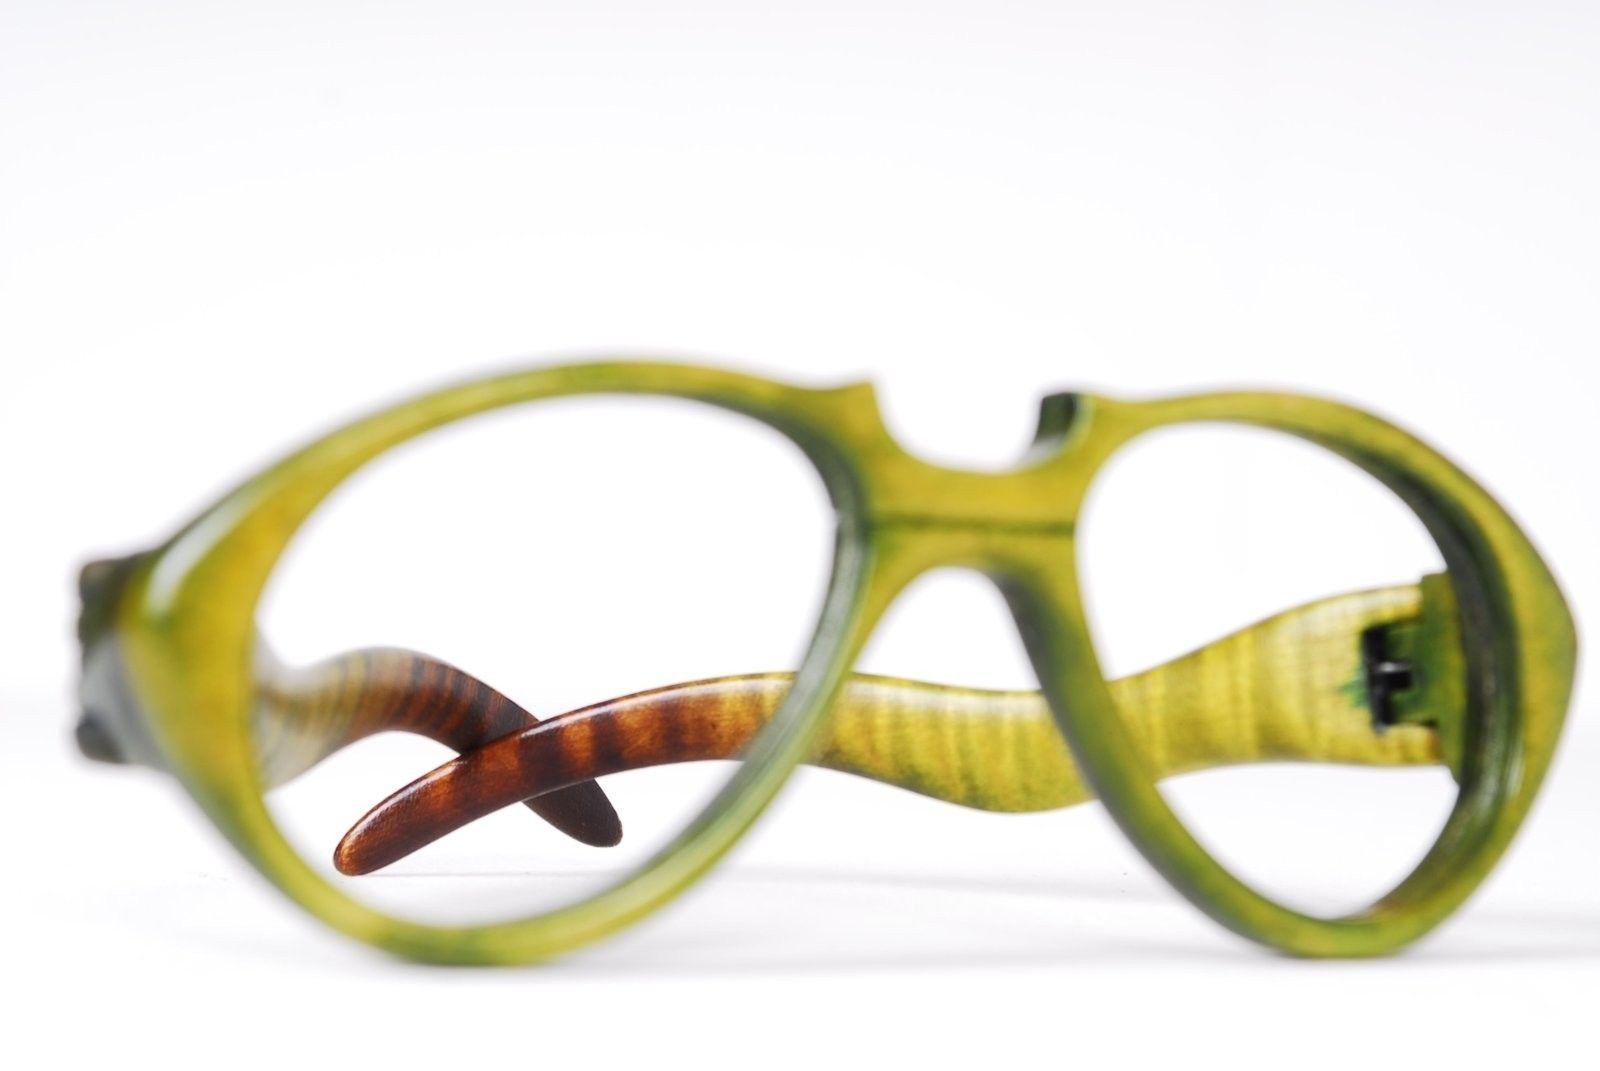 Spectacular Handmade Wooden Sunglasses - 2016-05 Jaromir Grun Oval 20.JPG